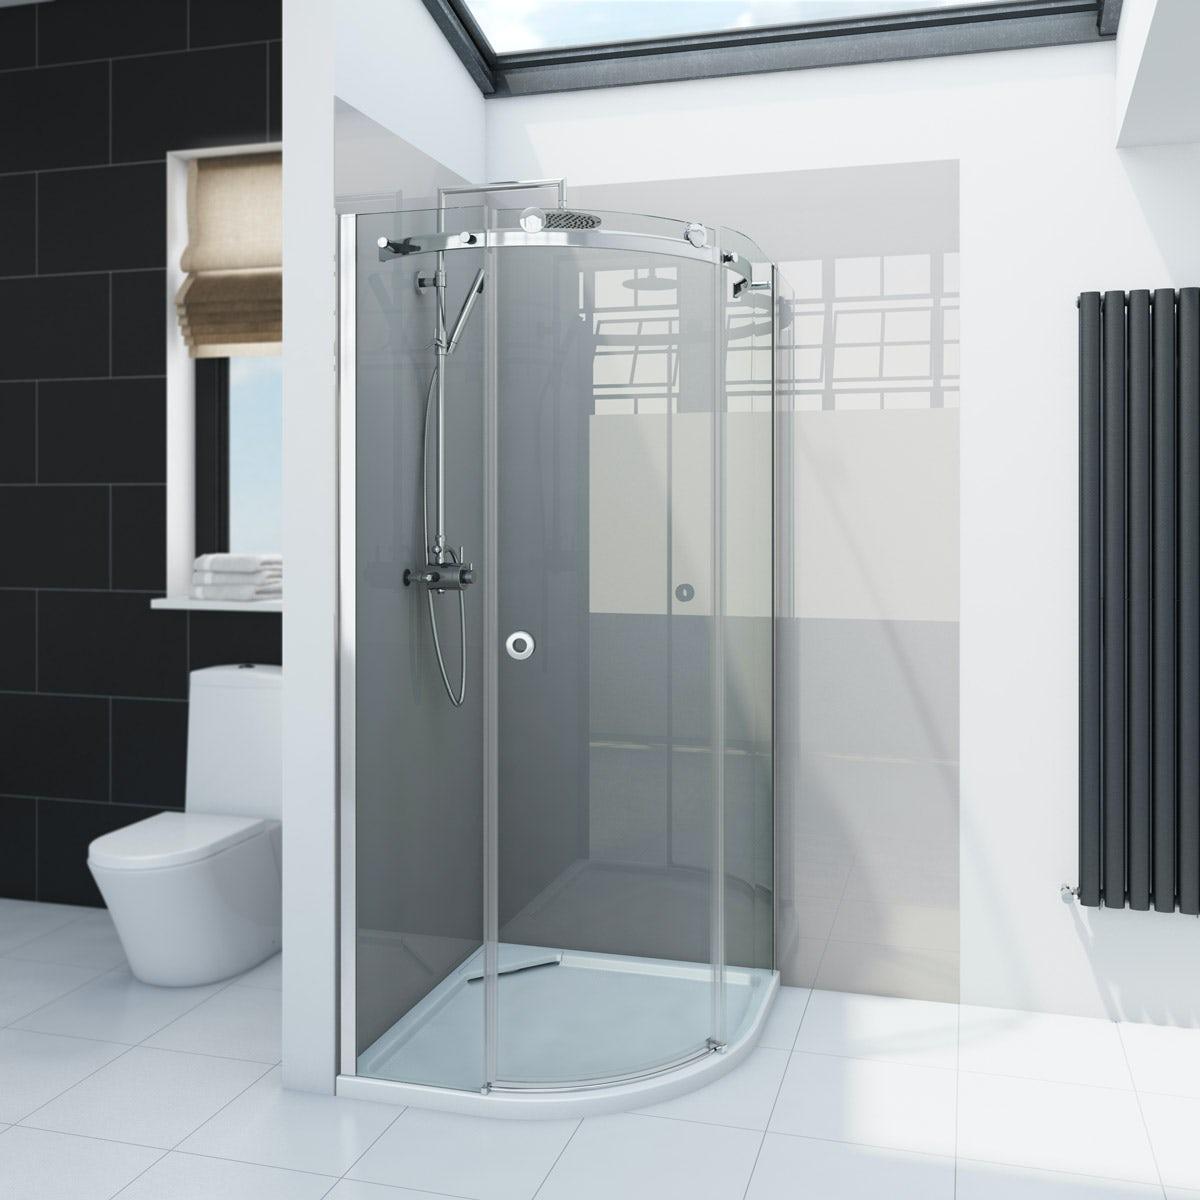 Zenolite plus stone acrylic shower wall panel 2440 x 1220